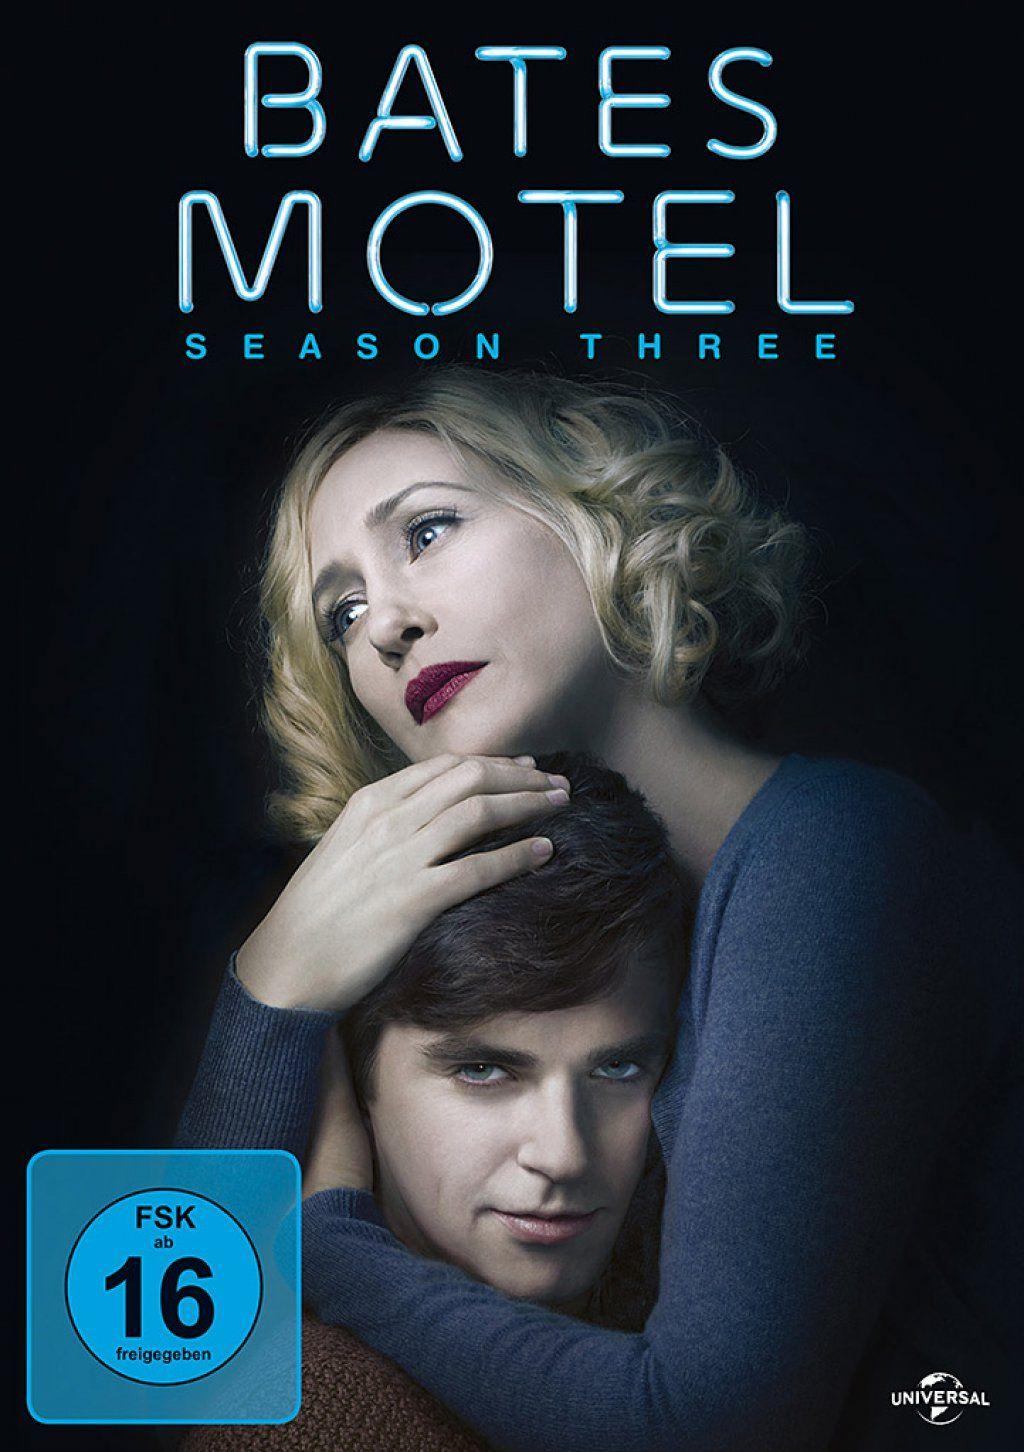 Bates Motel - Season 3 (3 Discs)